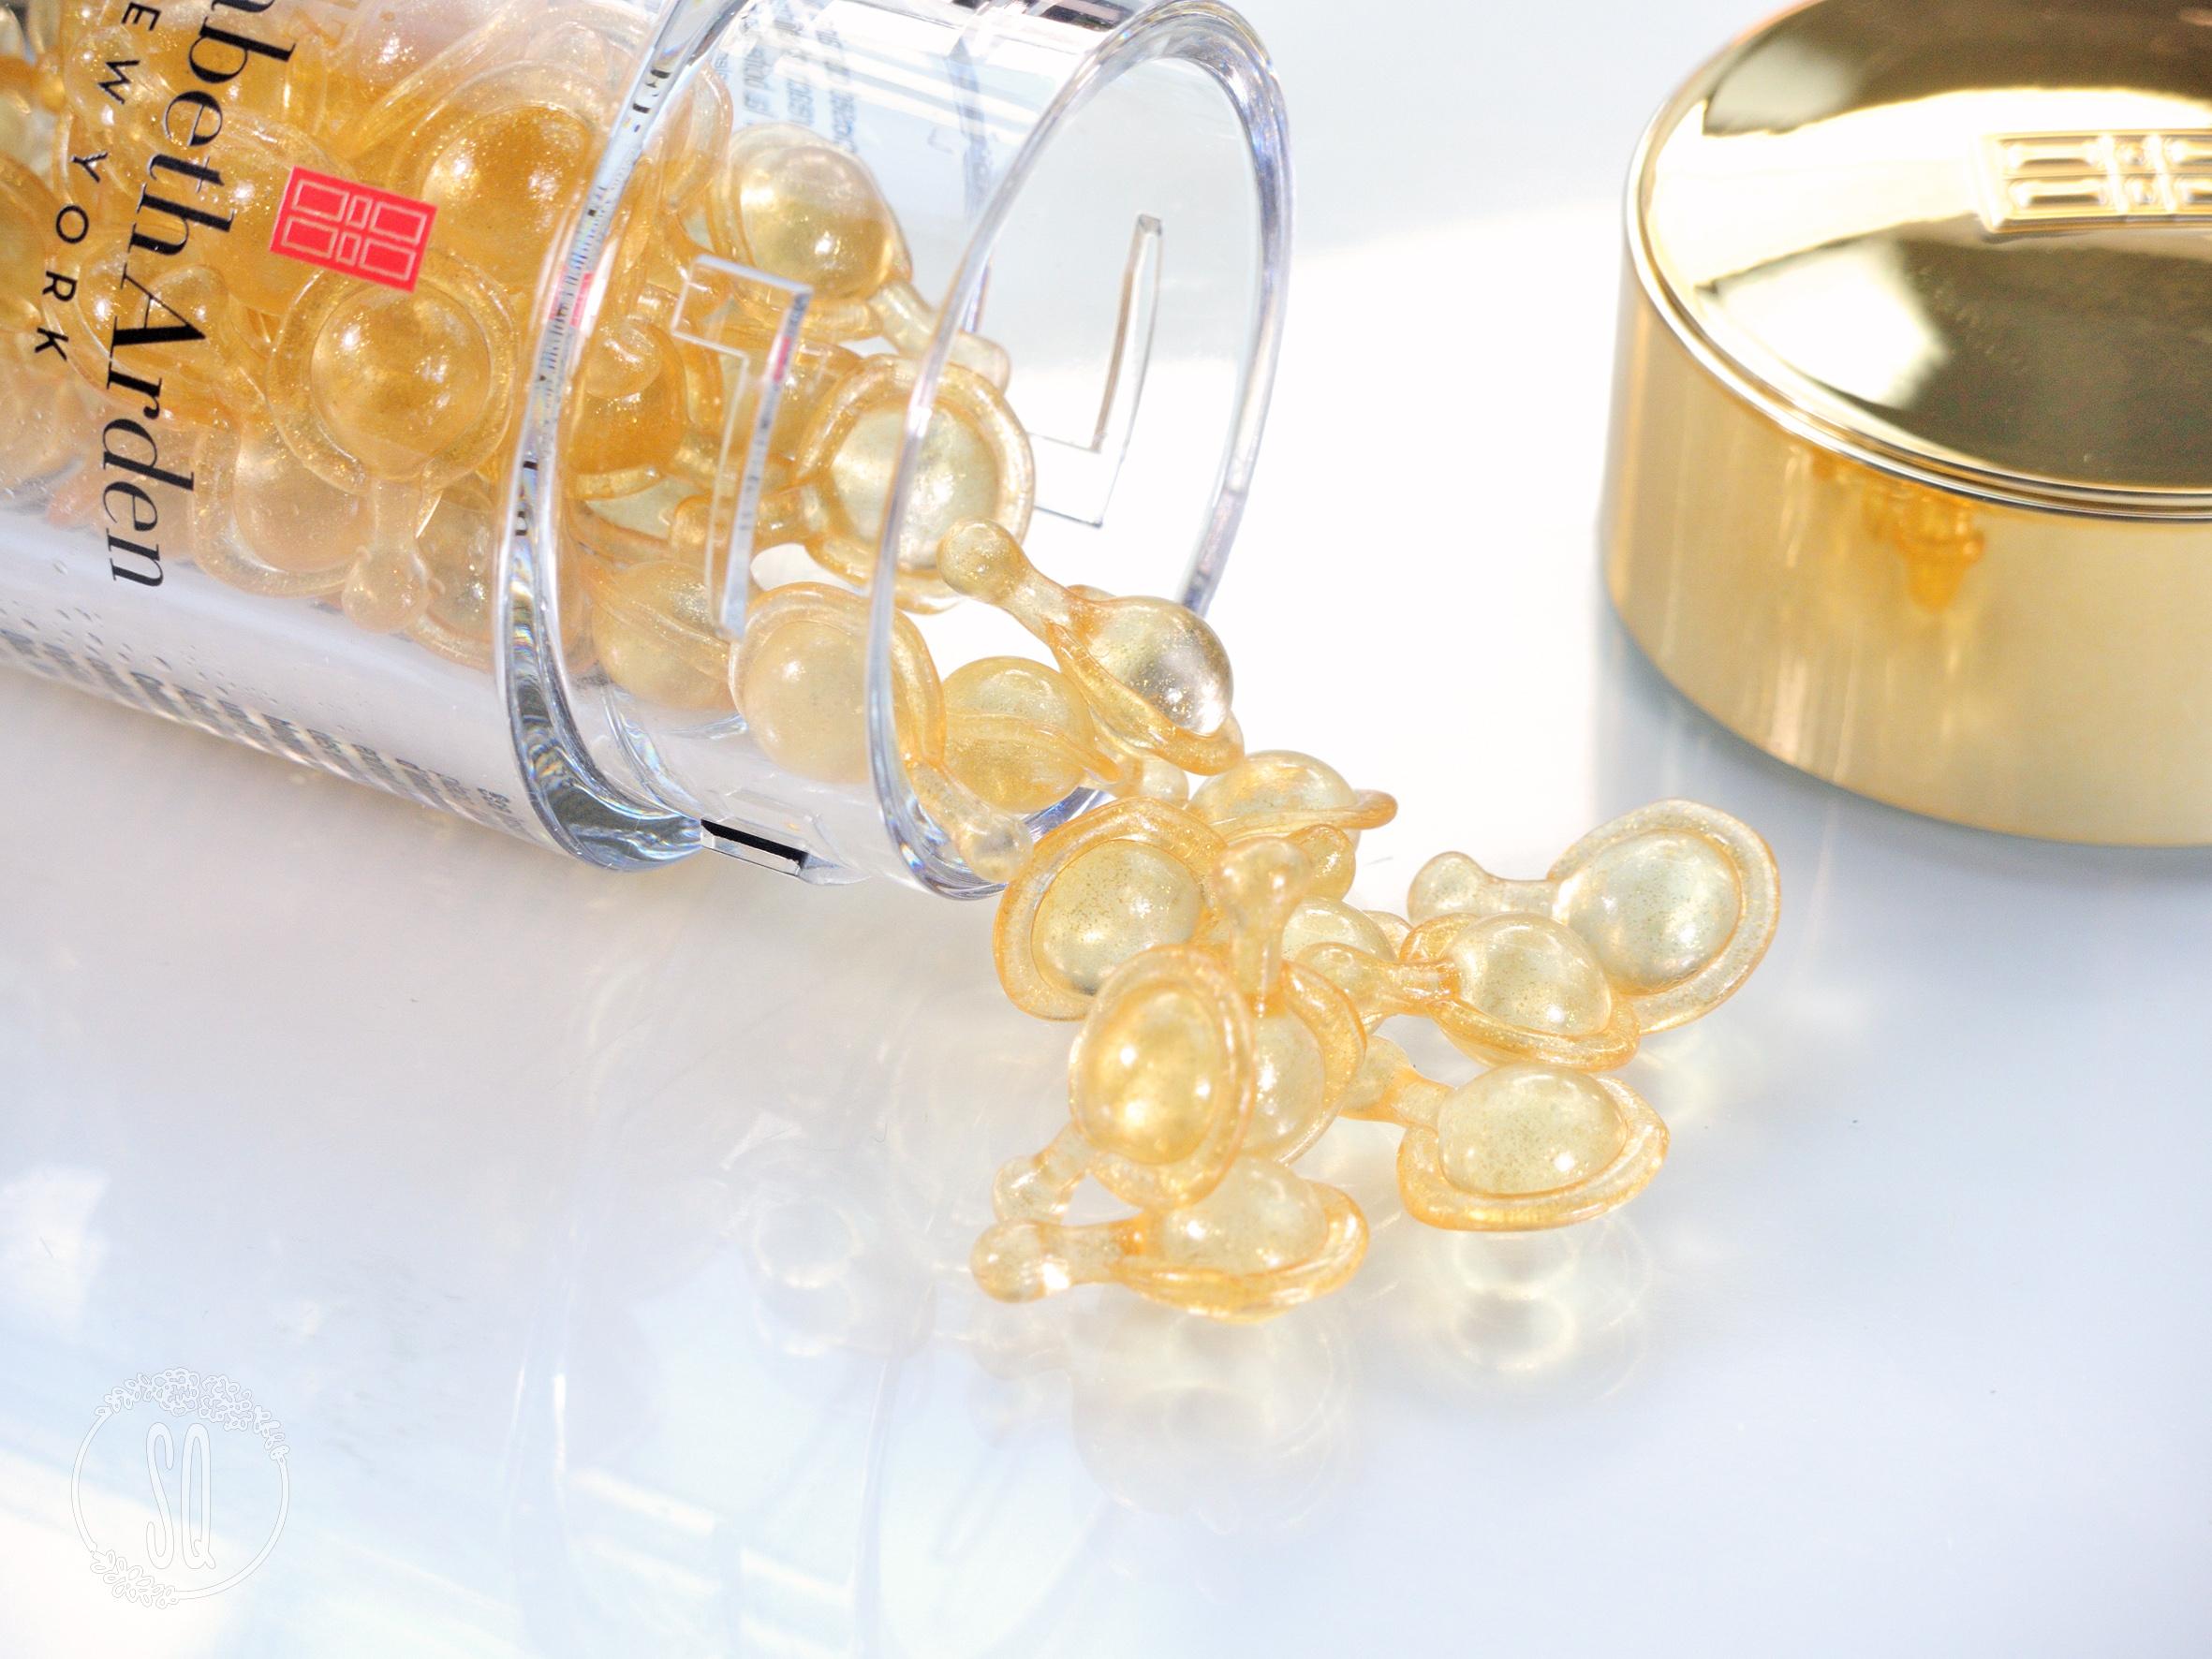 Cápsulas Advanced Ceramide Capsules Daily Youth Restoring Eye Serum de Elizabeth Arden